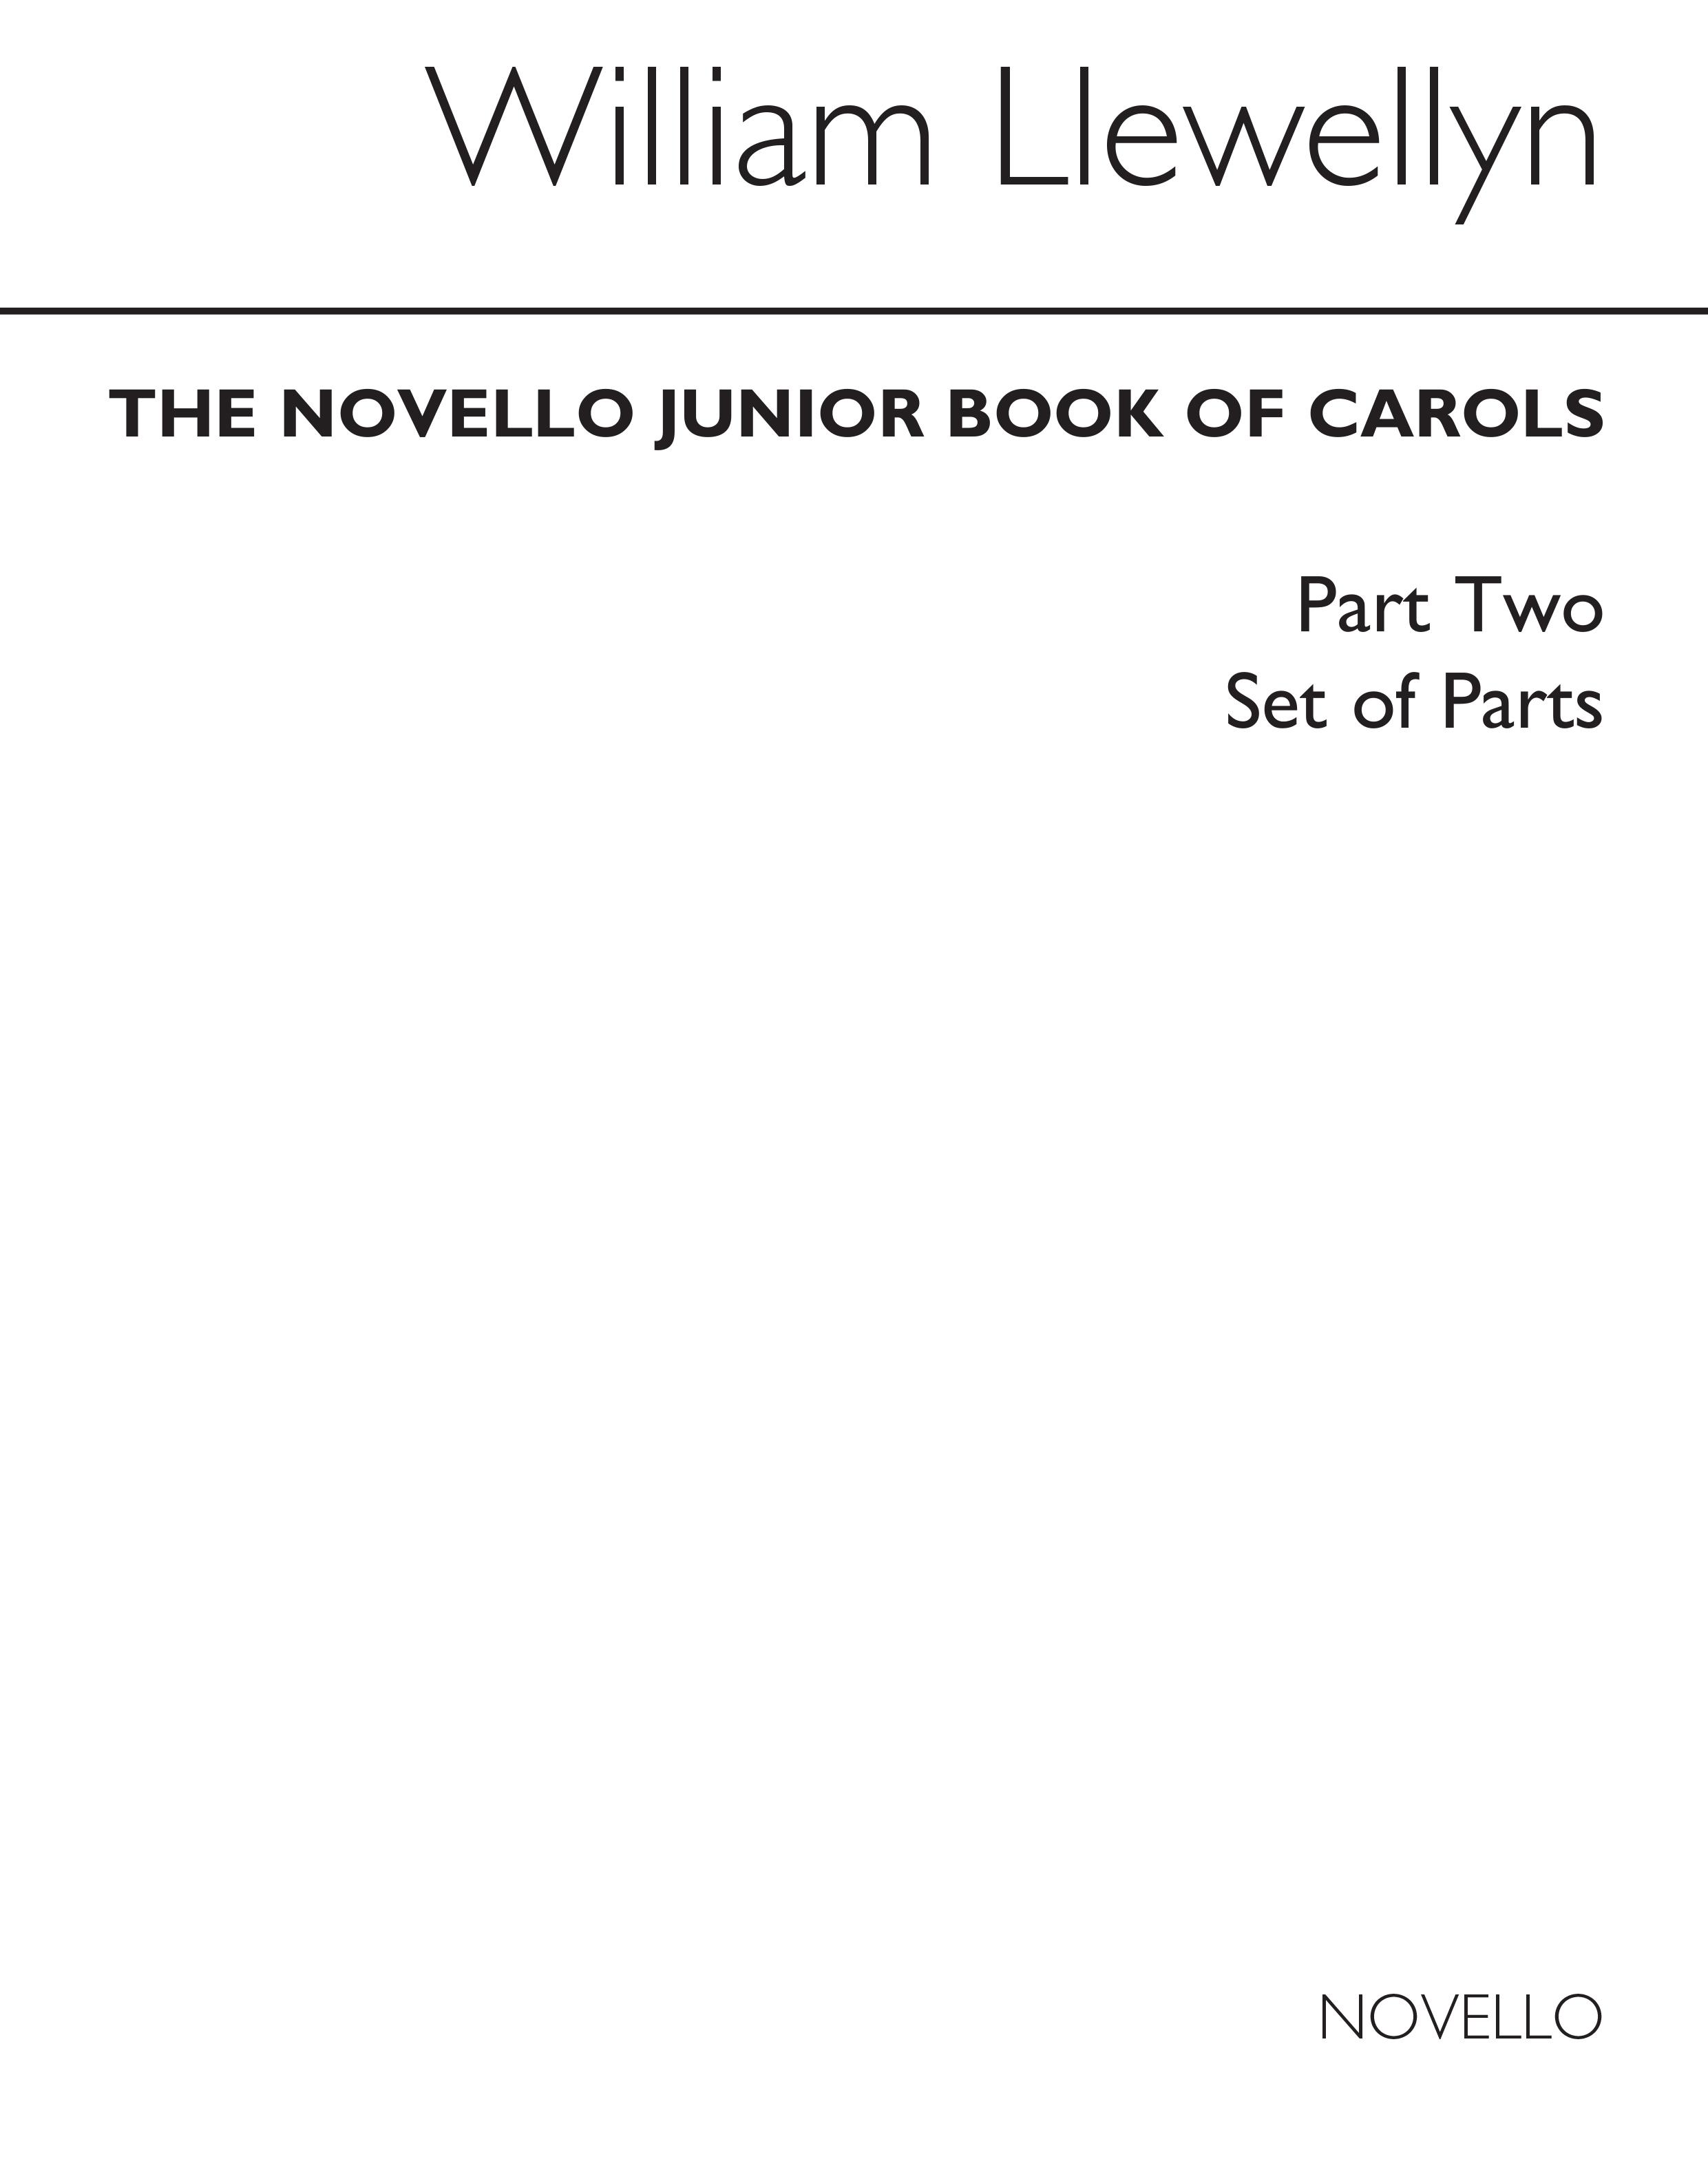 The Novello Junior Book Of Carols Part 2: Upper Voices: Vocal Score